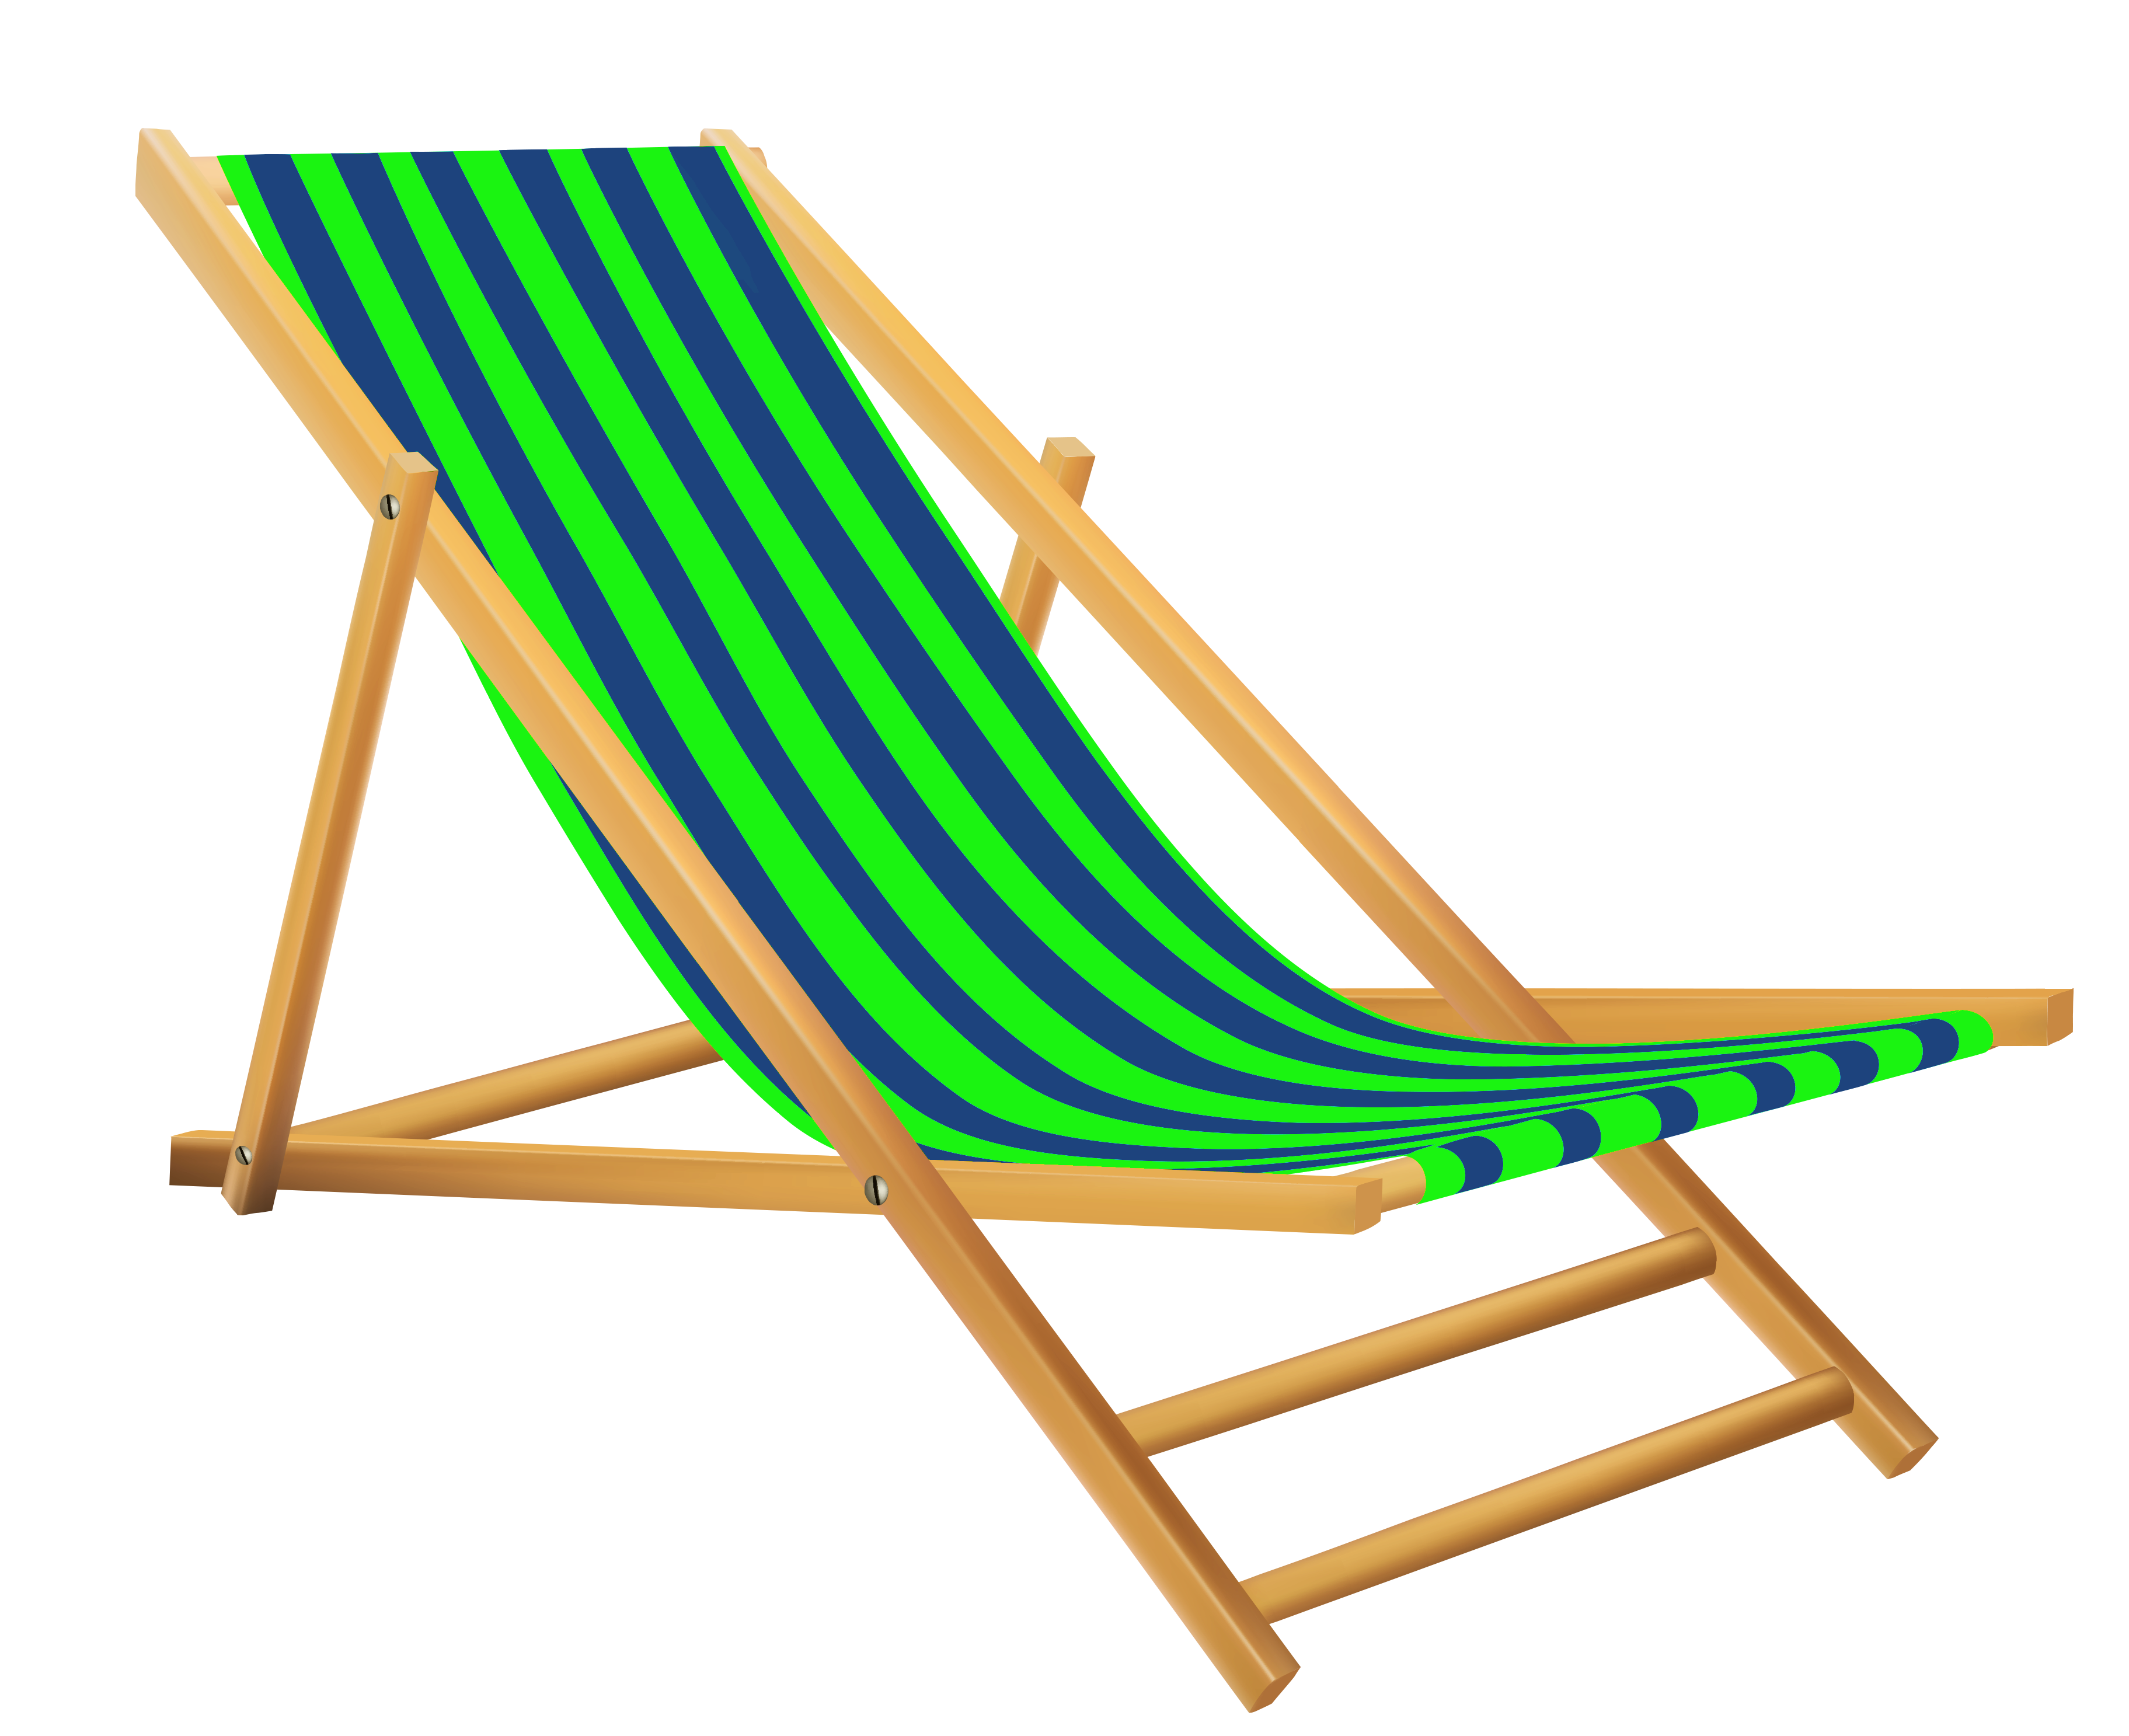 Eames chaise longue clip. Furniture clipart lounge chair